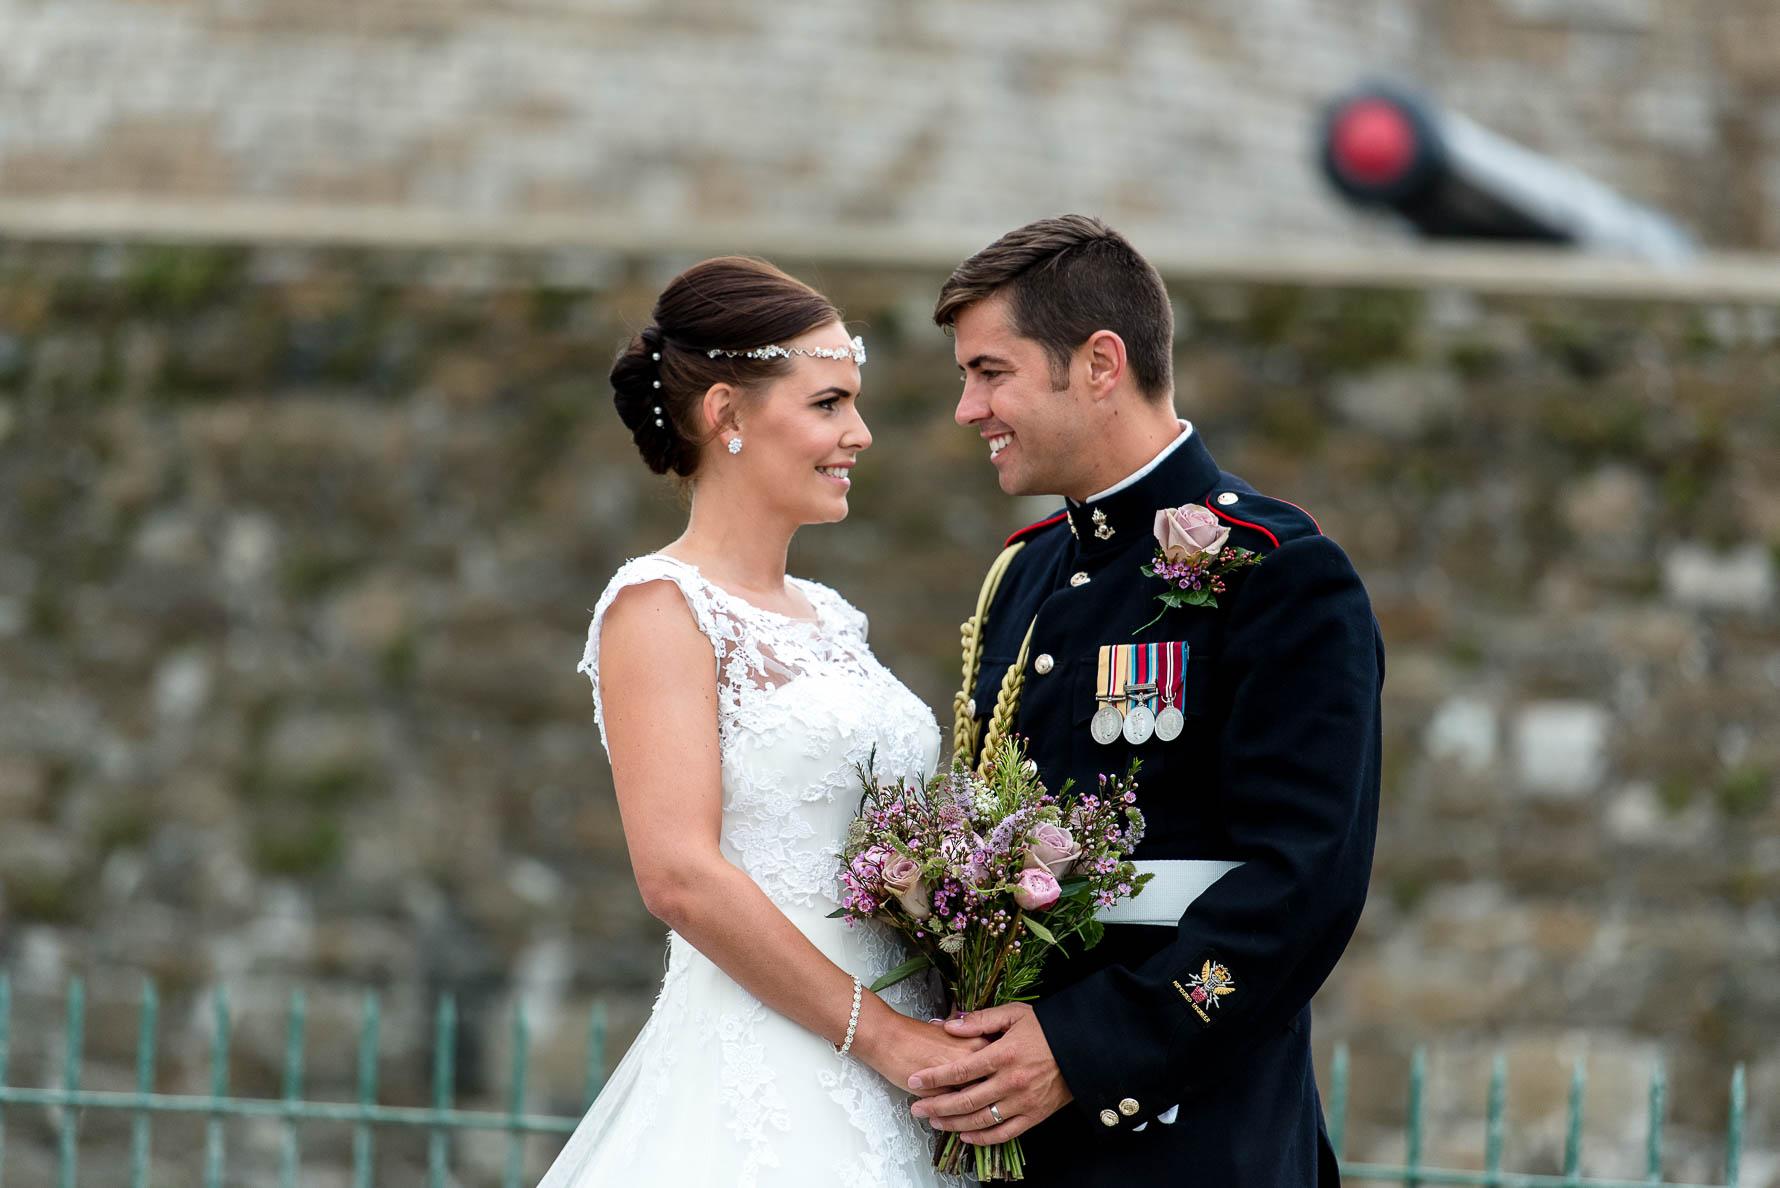 Wedding in Deal-4.jpg